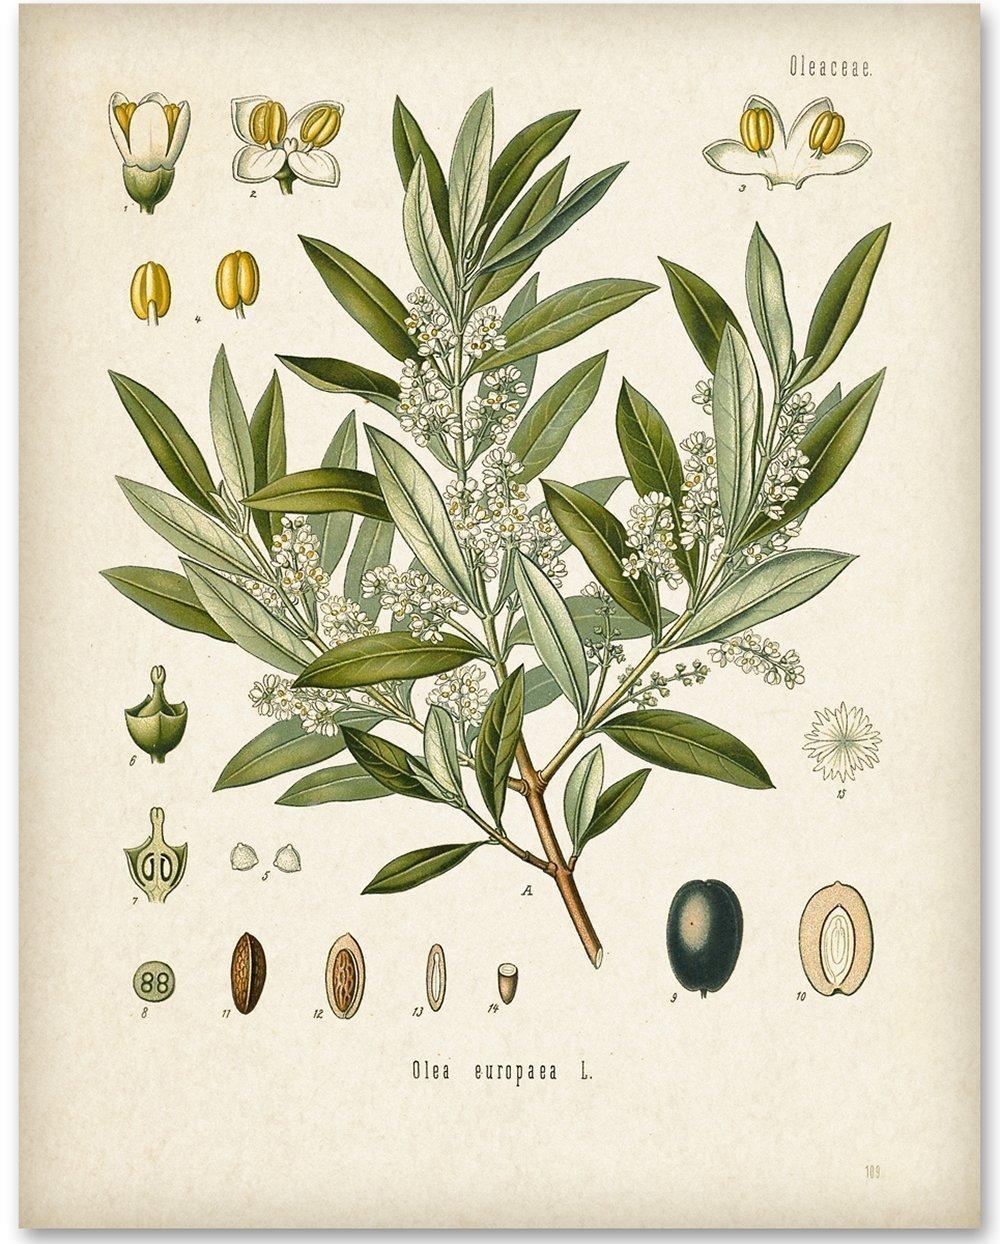 Olive Branch Botanical Artwork - 11x14 Unframed Art Print - Great Home Decor